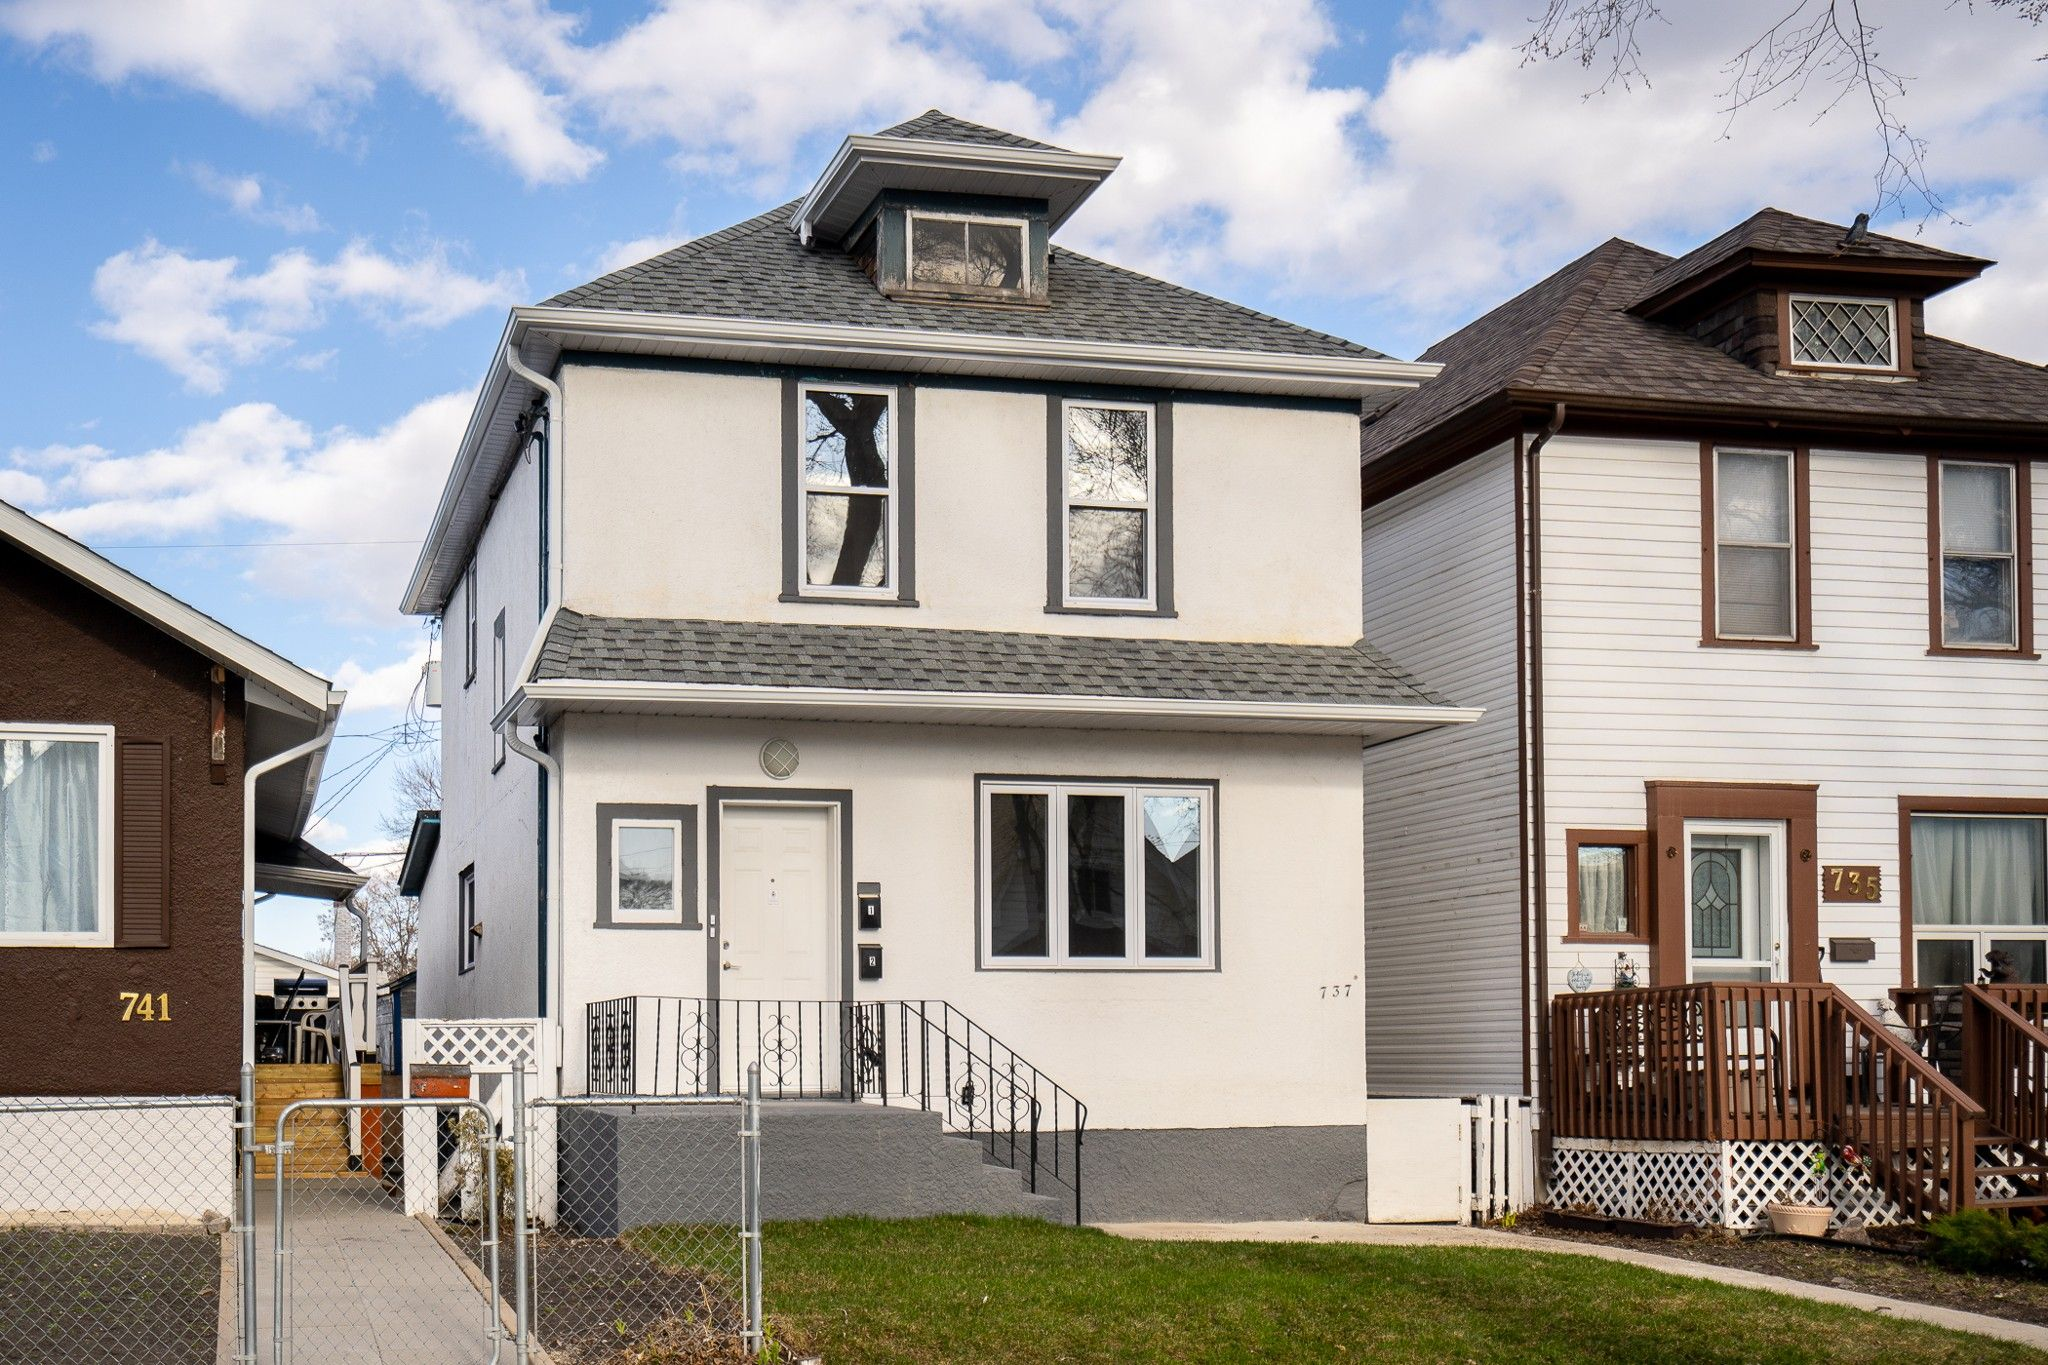 Main Photo: 737 Lipton Street in Winnipeg: West End House for sale (5C)  : MLS®# 202110577